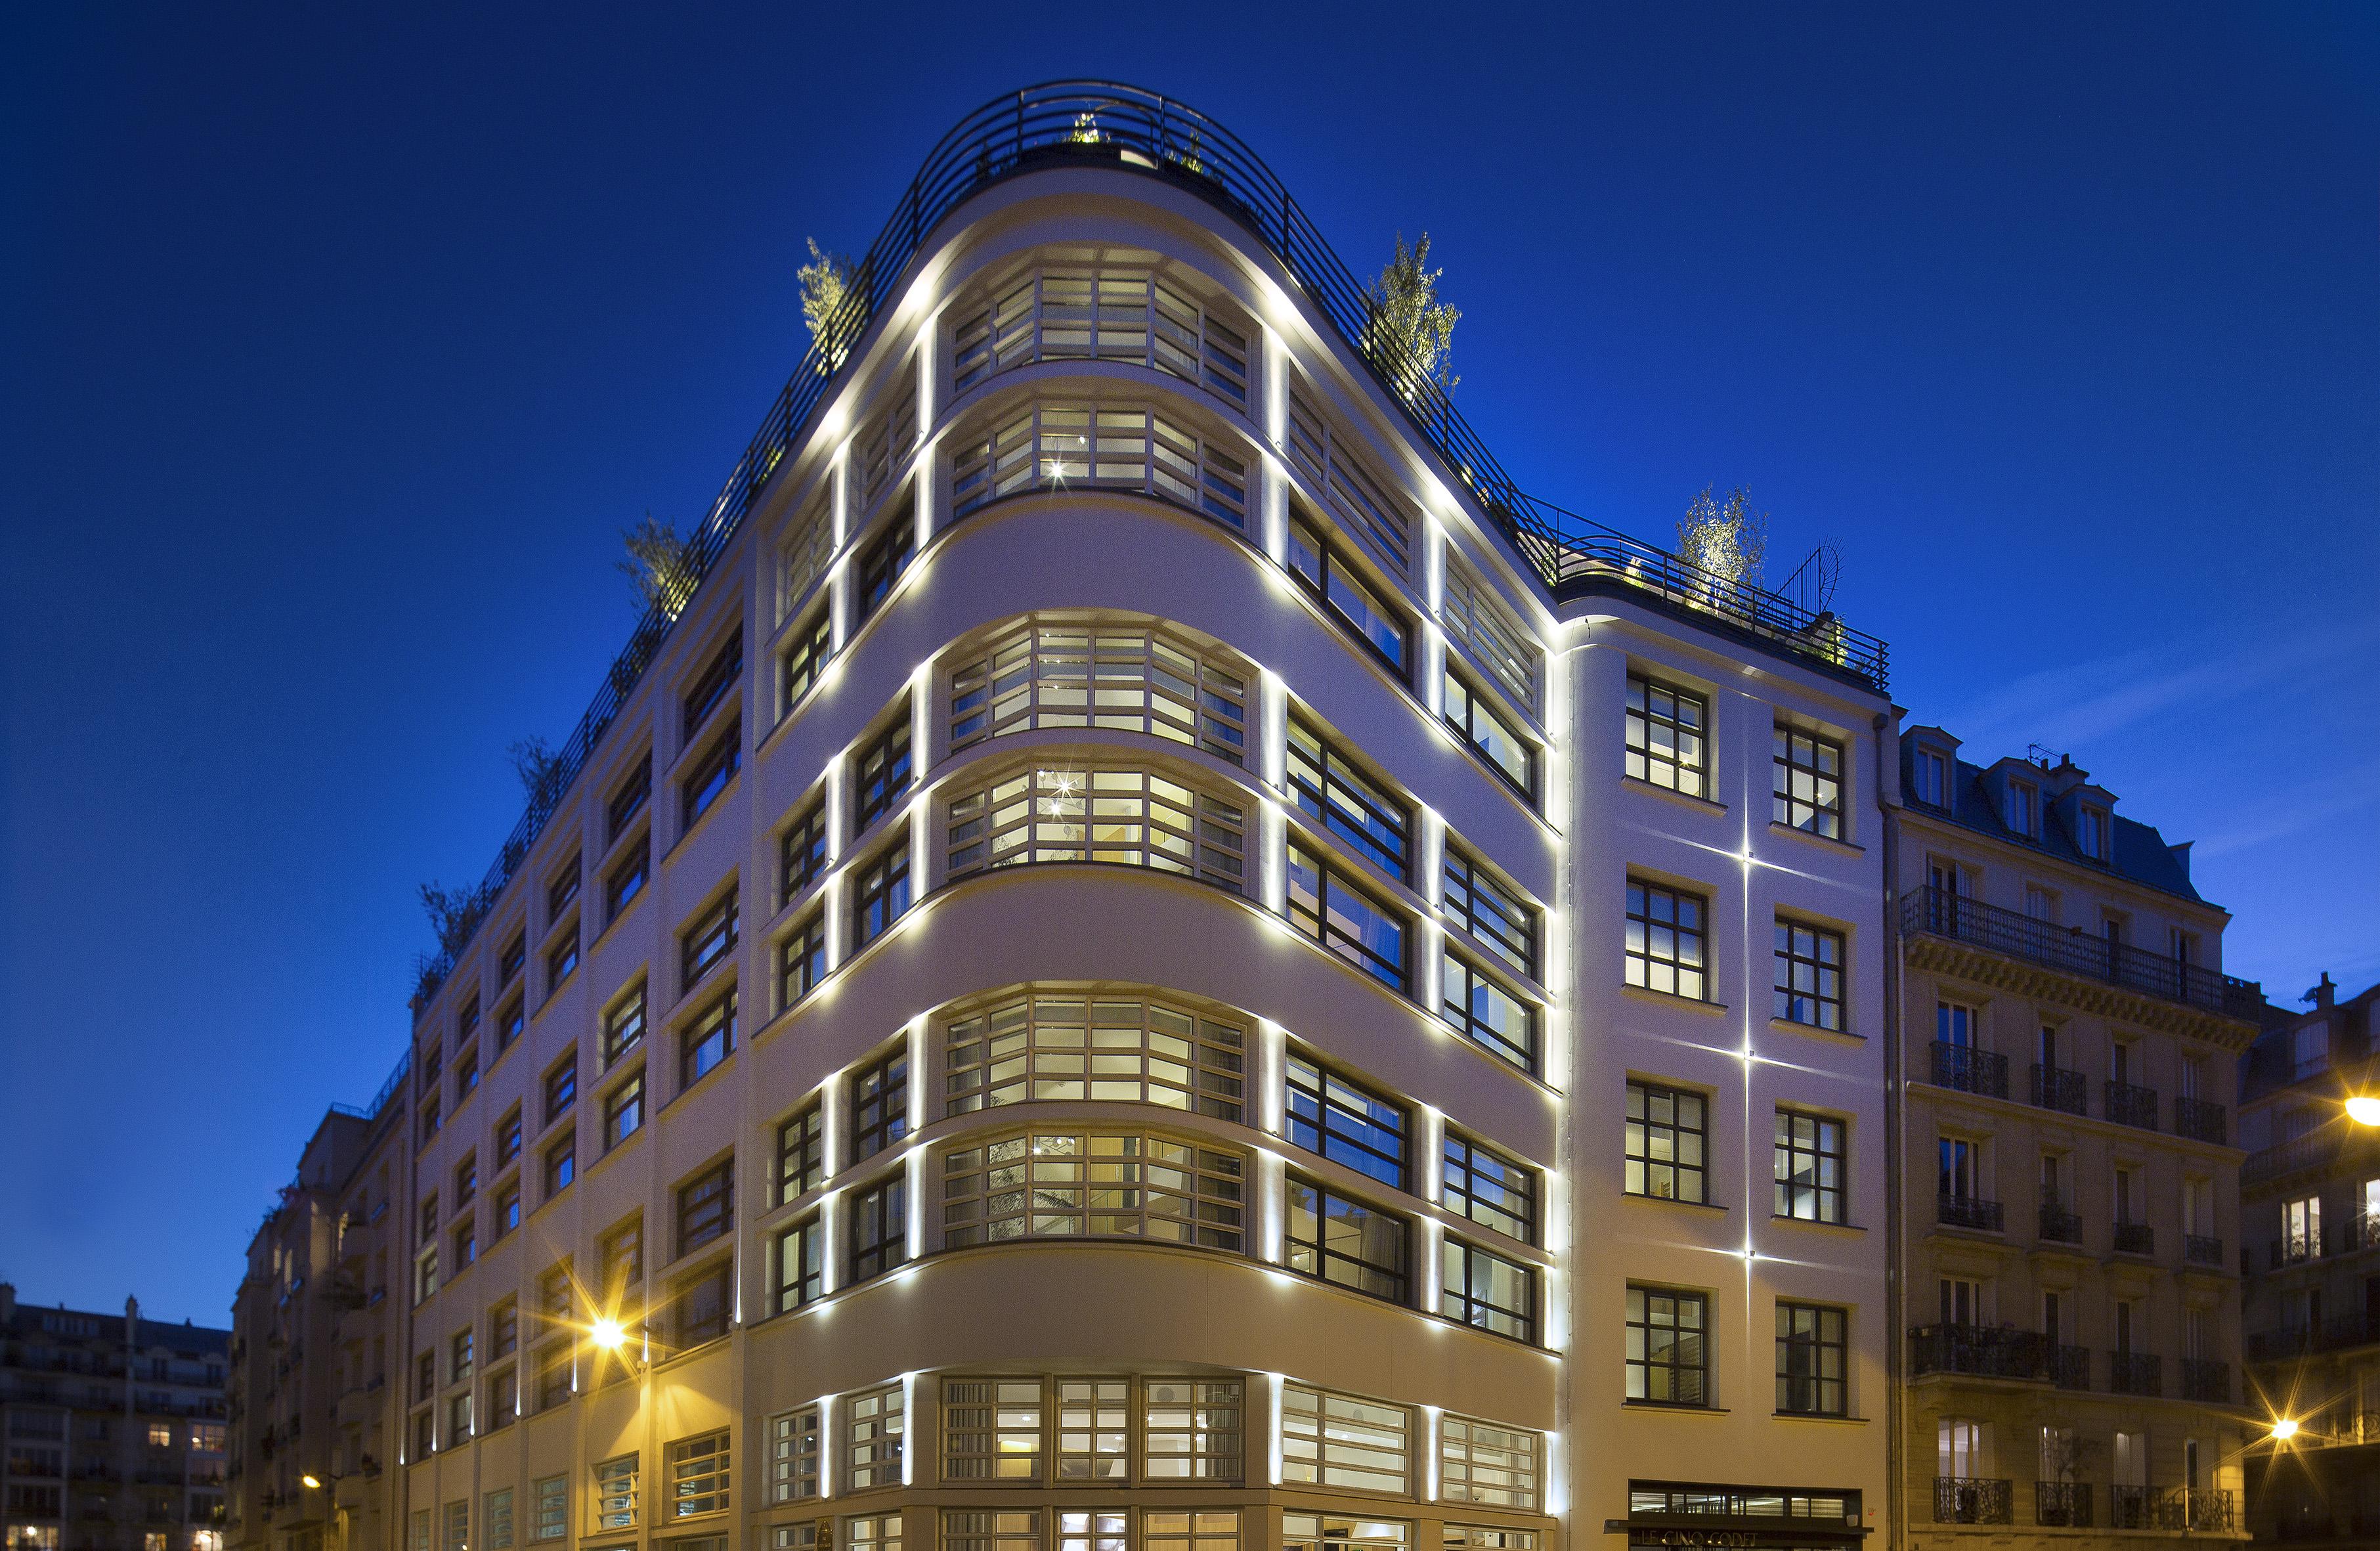 7 AGENCE NUEL_LE 5 CODET_C BIELSA--facade nuit-01 md